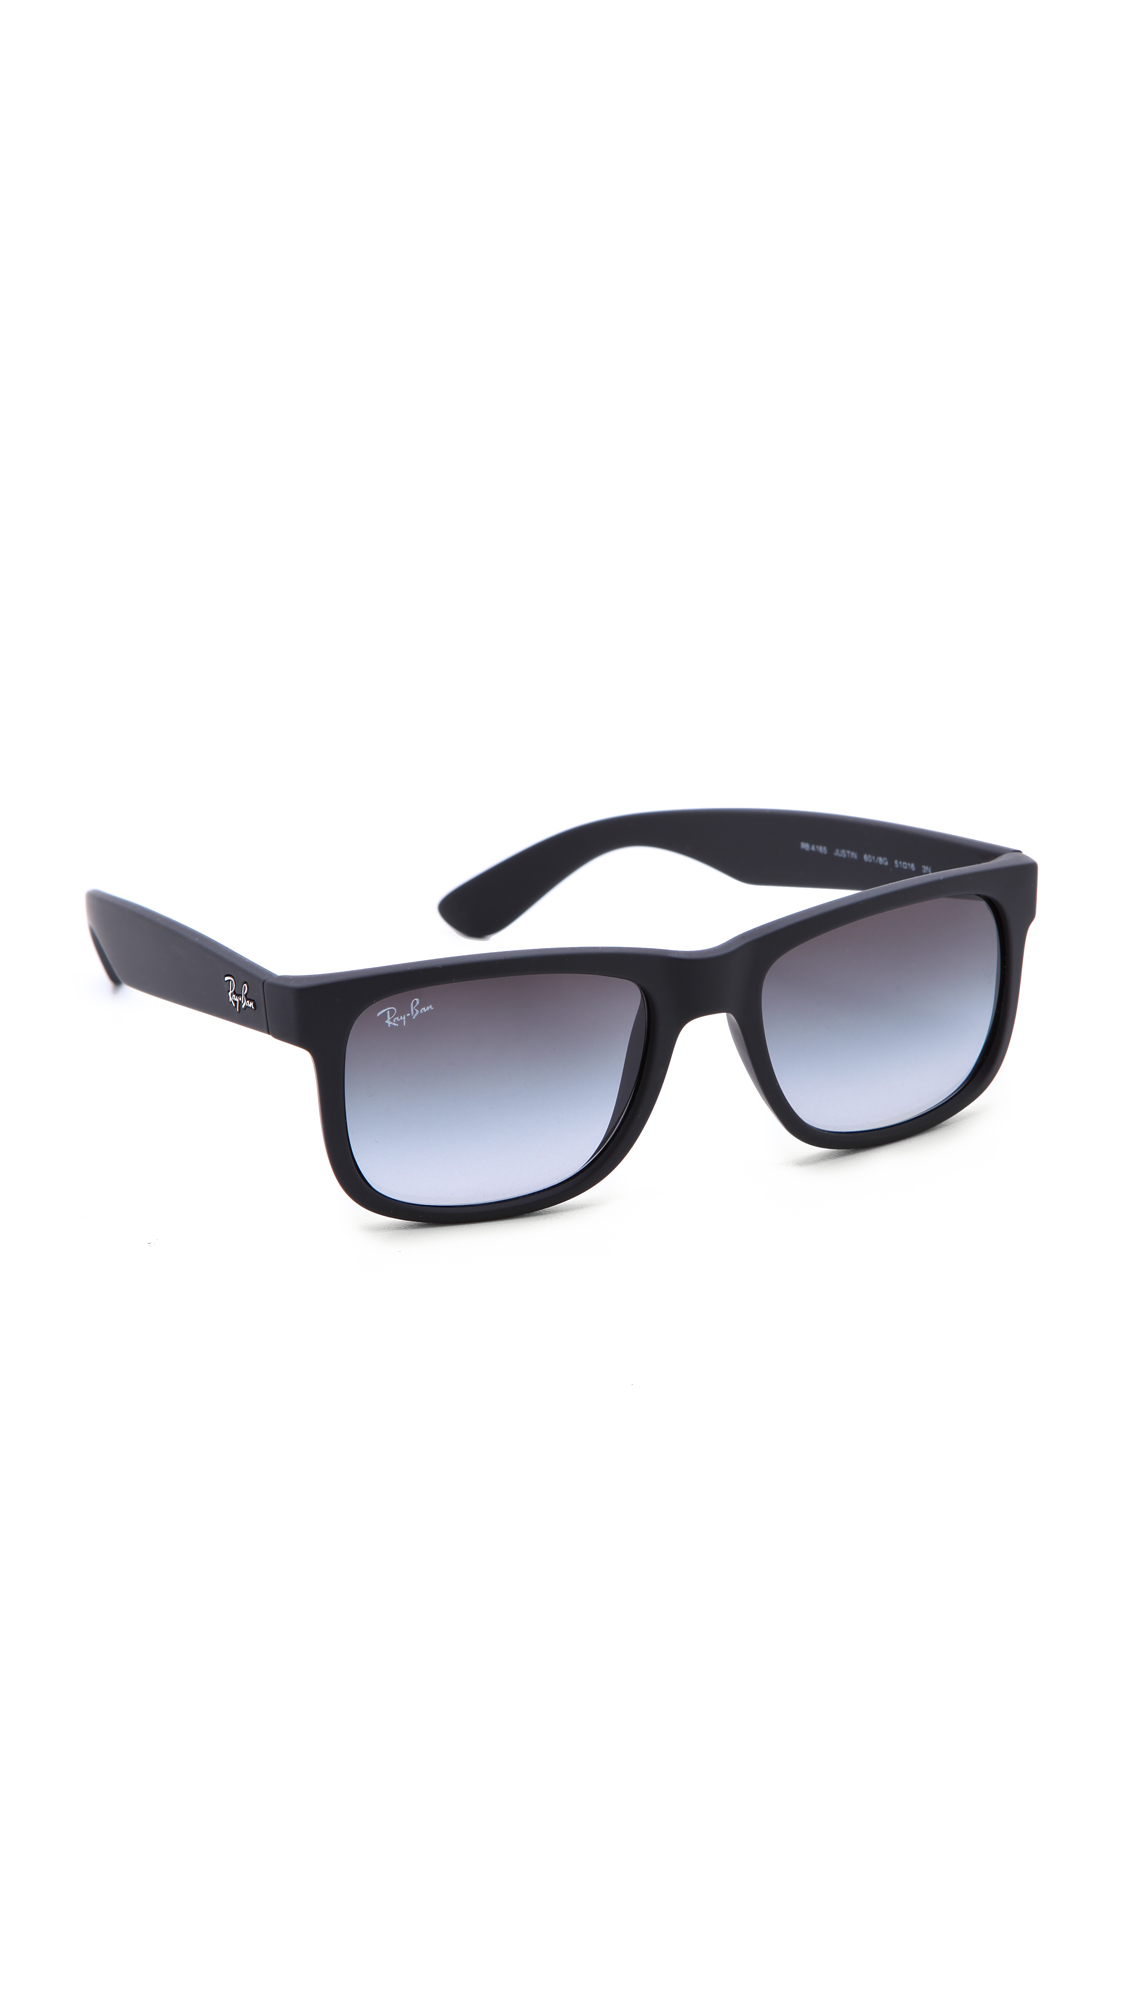 ray ban justin sunglasses in black rubber black gradient grey lyst. Black Bedroom Furniture Sets. Home Design Ideas